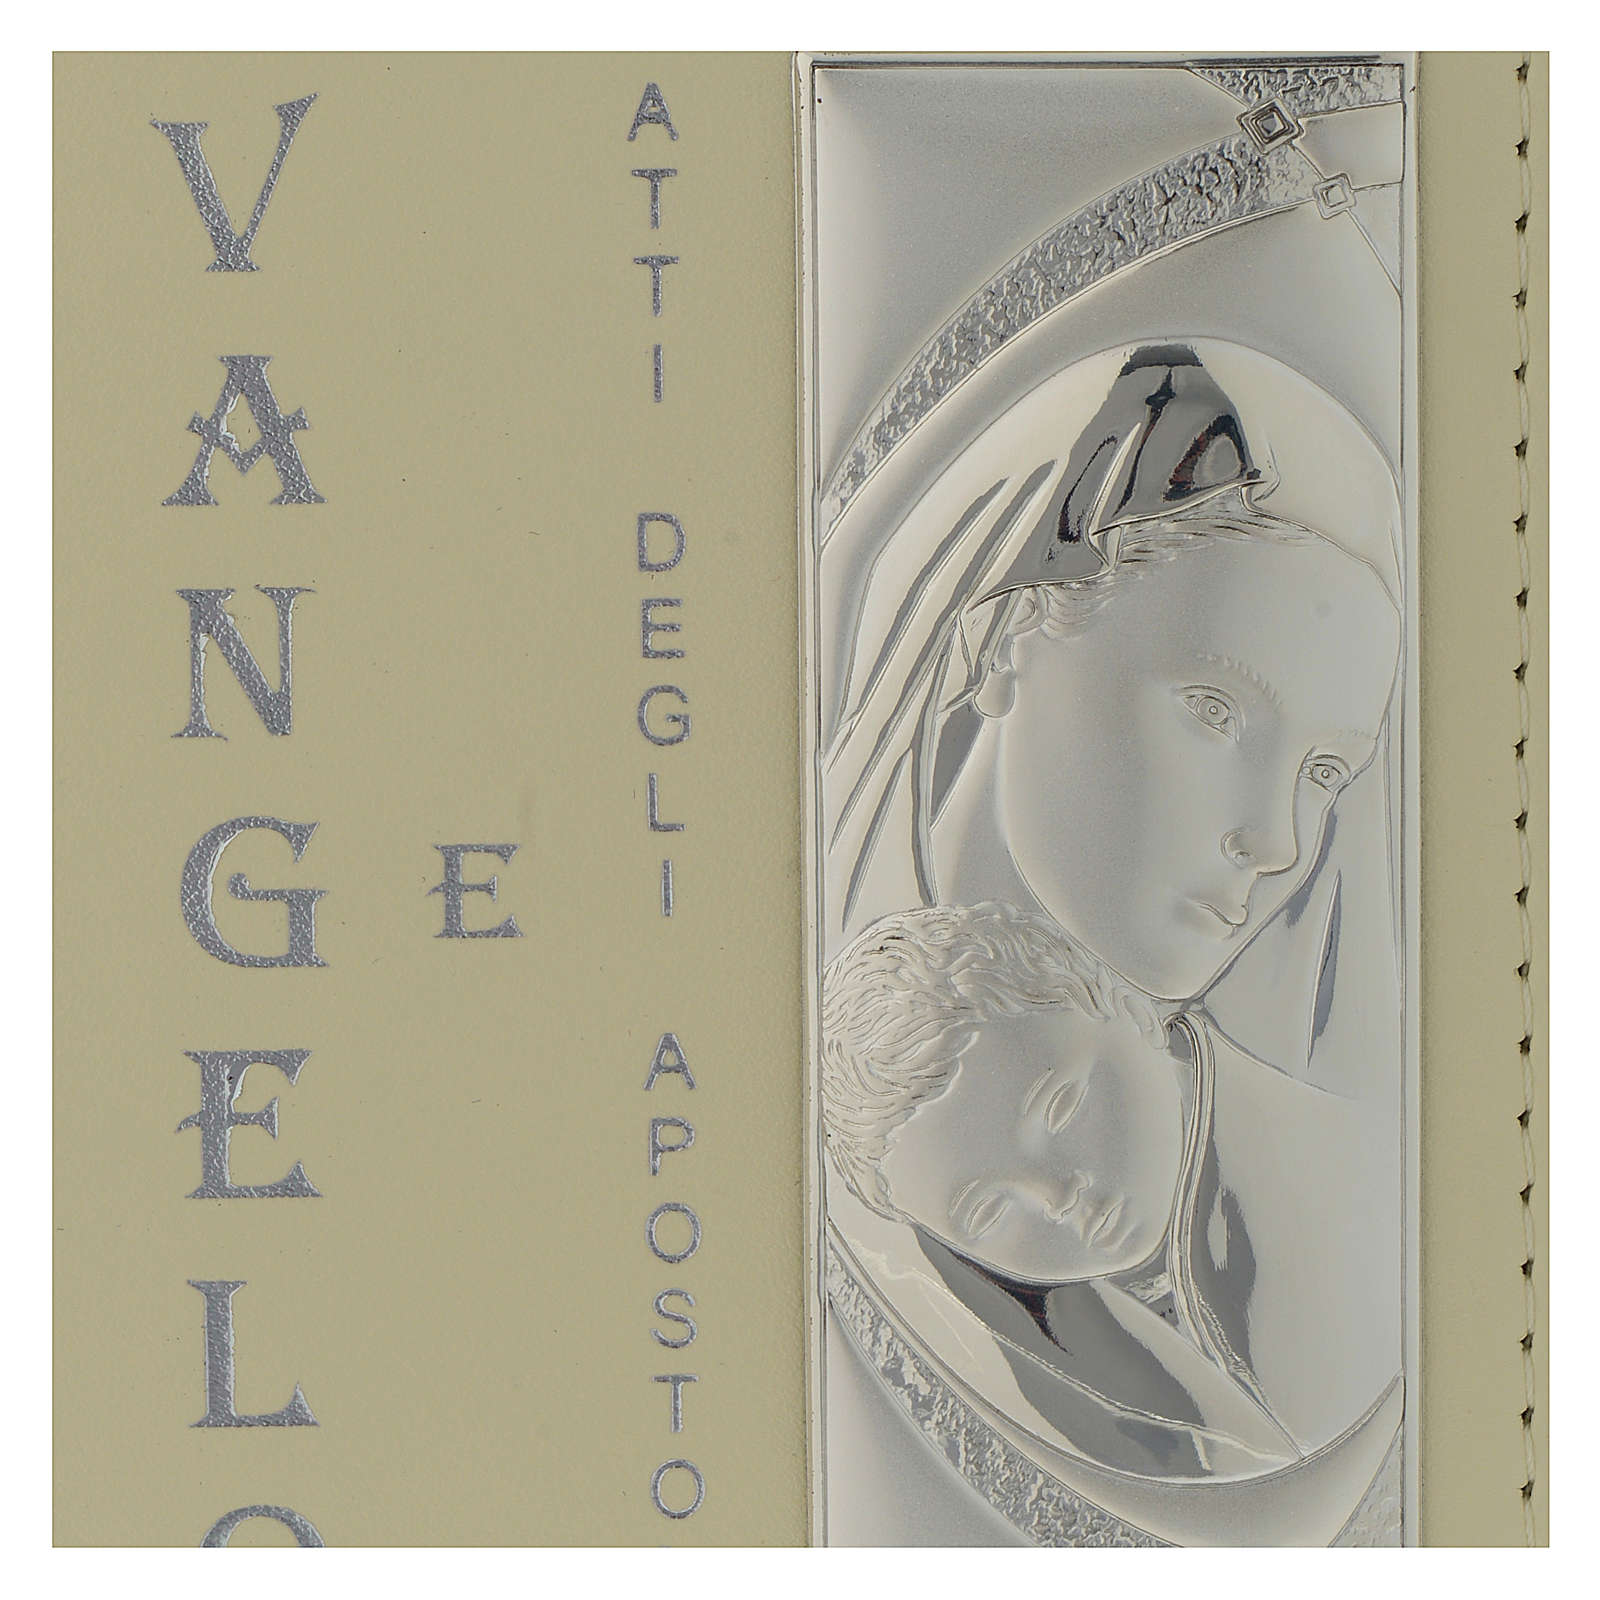 Vangelo Battesimo copertina in similpelle e placca Argento Bilaminato 10X15 cm 3